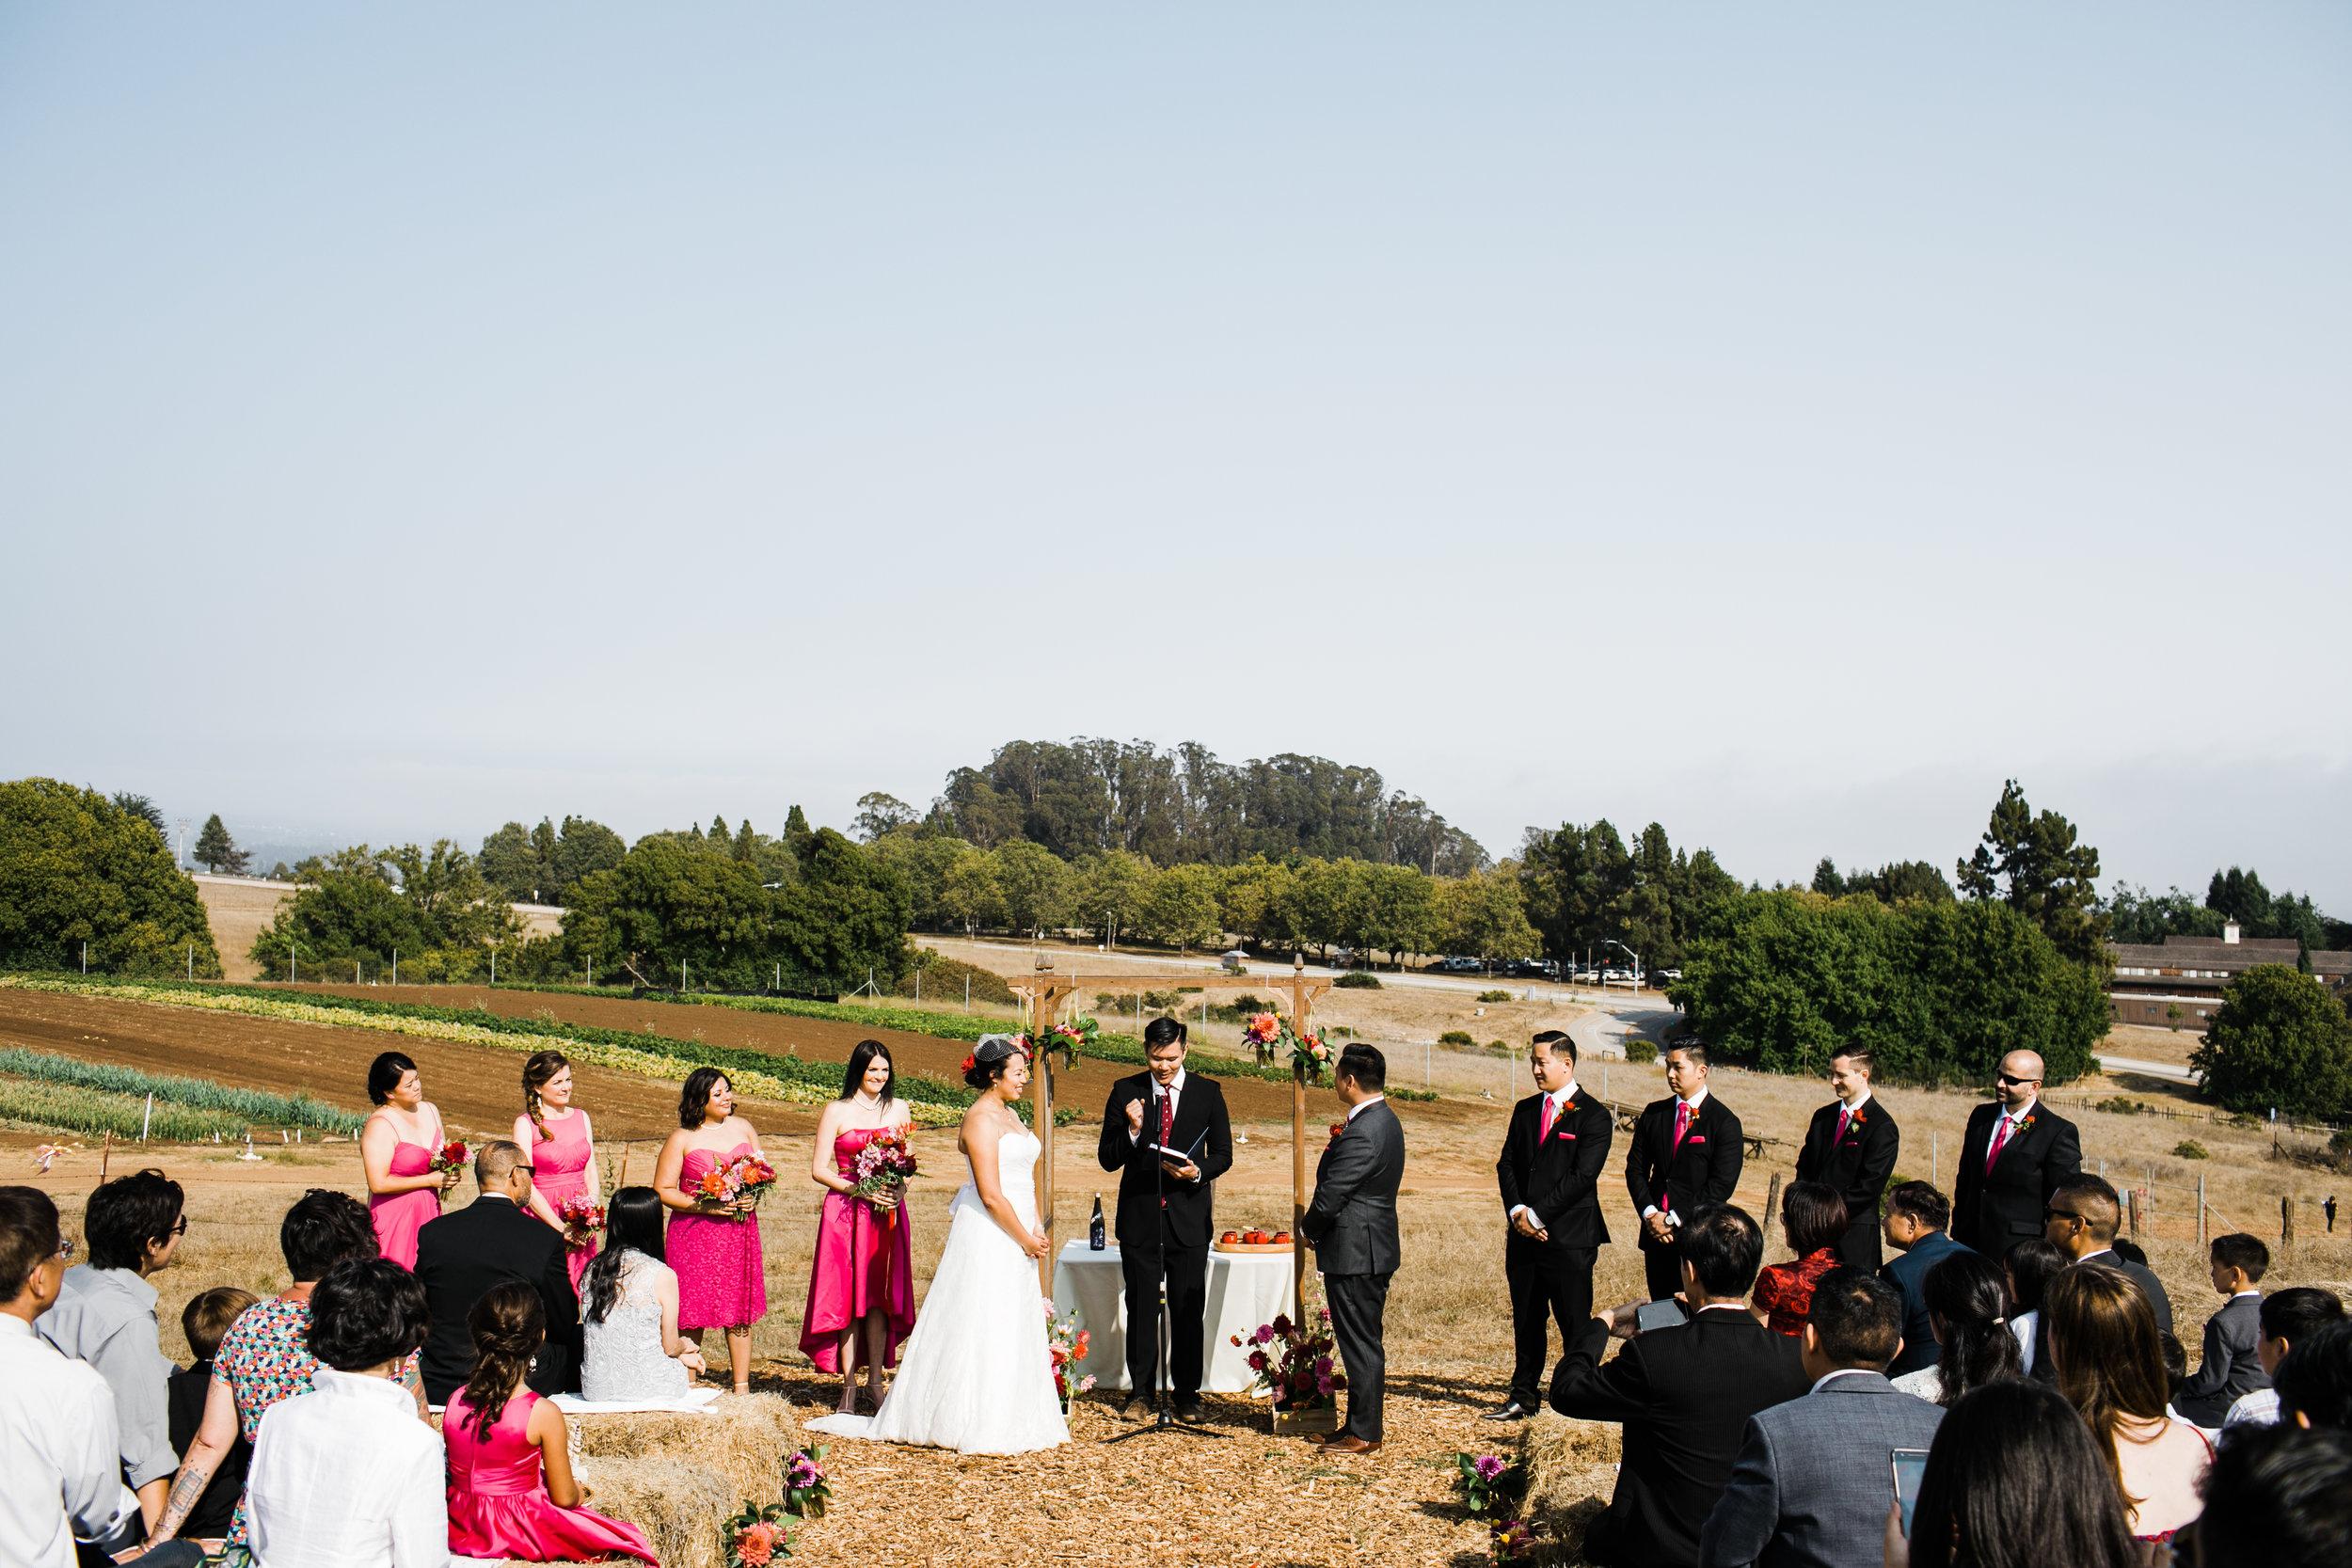 WEDDINGS - Casual to Elaborate.